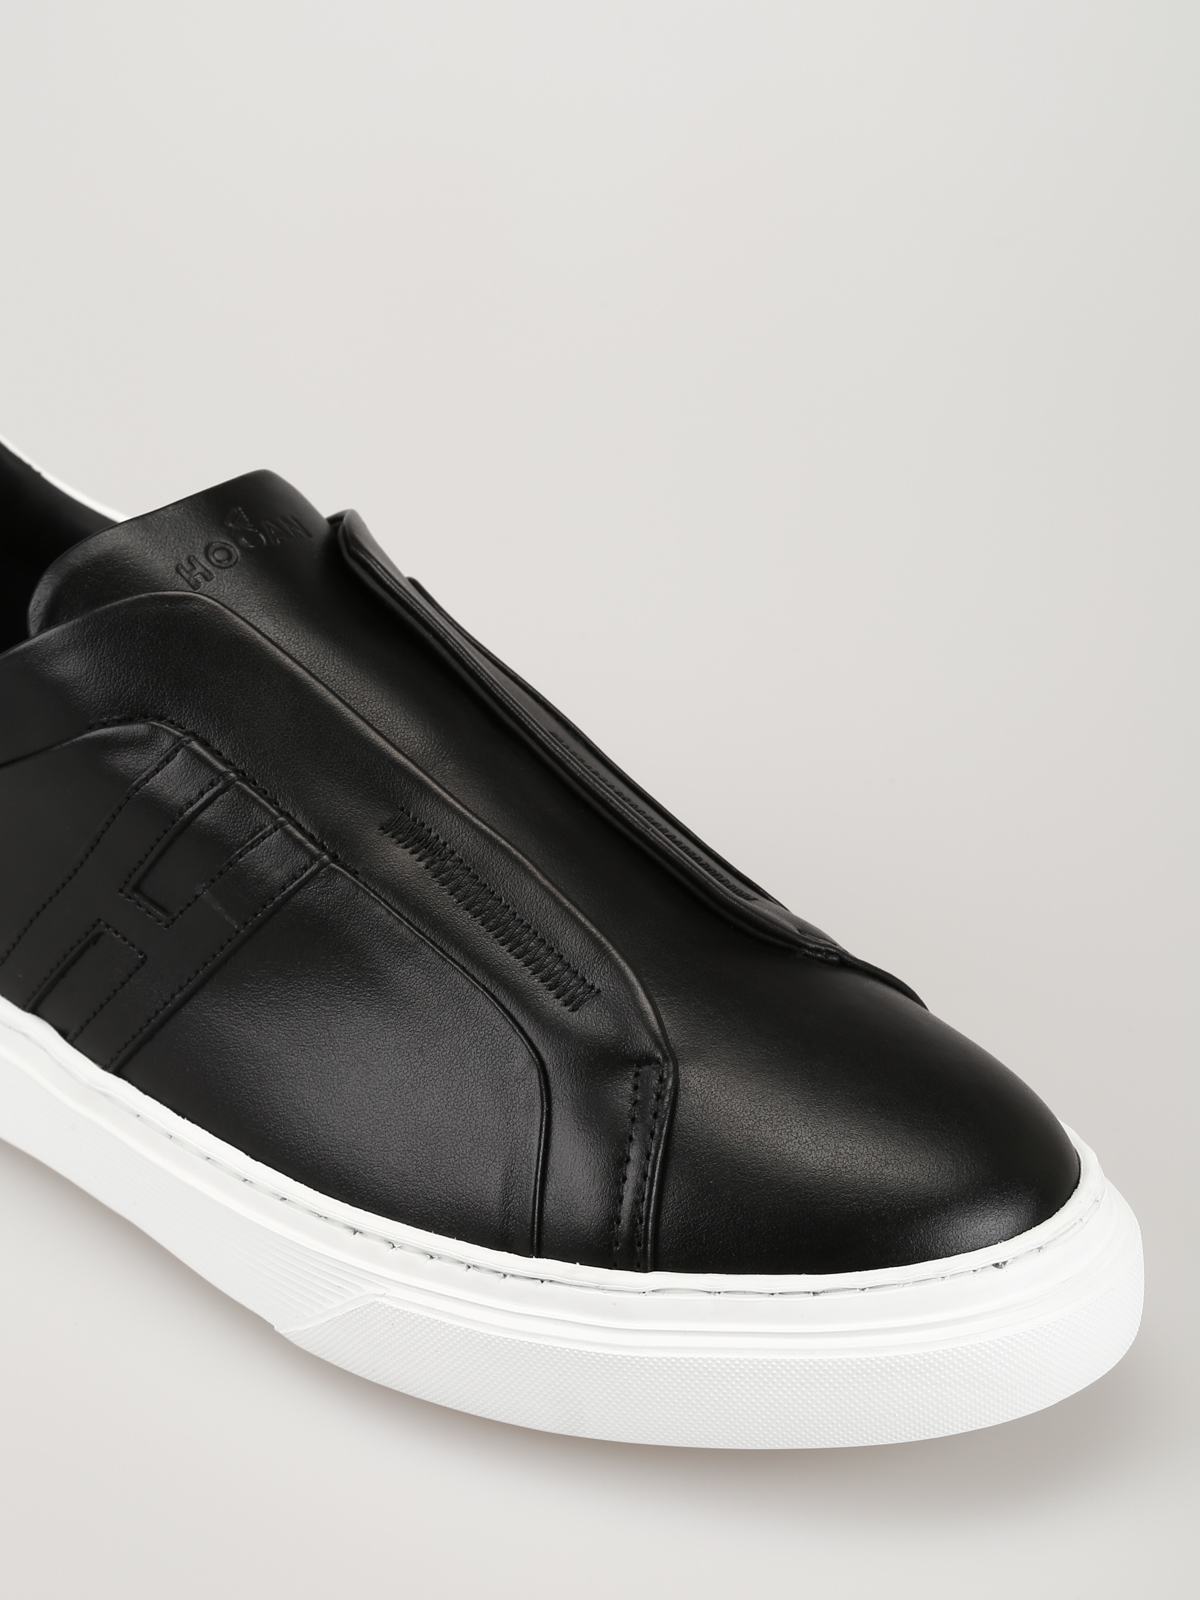 Hogan - H365 leather slip-ons - trainers - HXM3650BE00KFM0002 ...